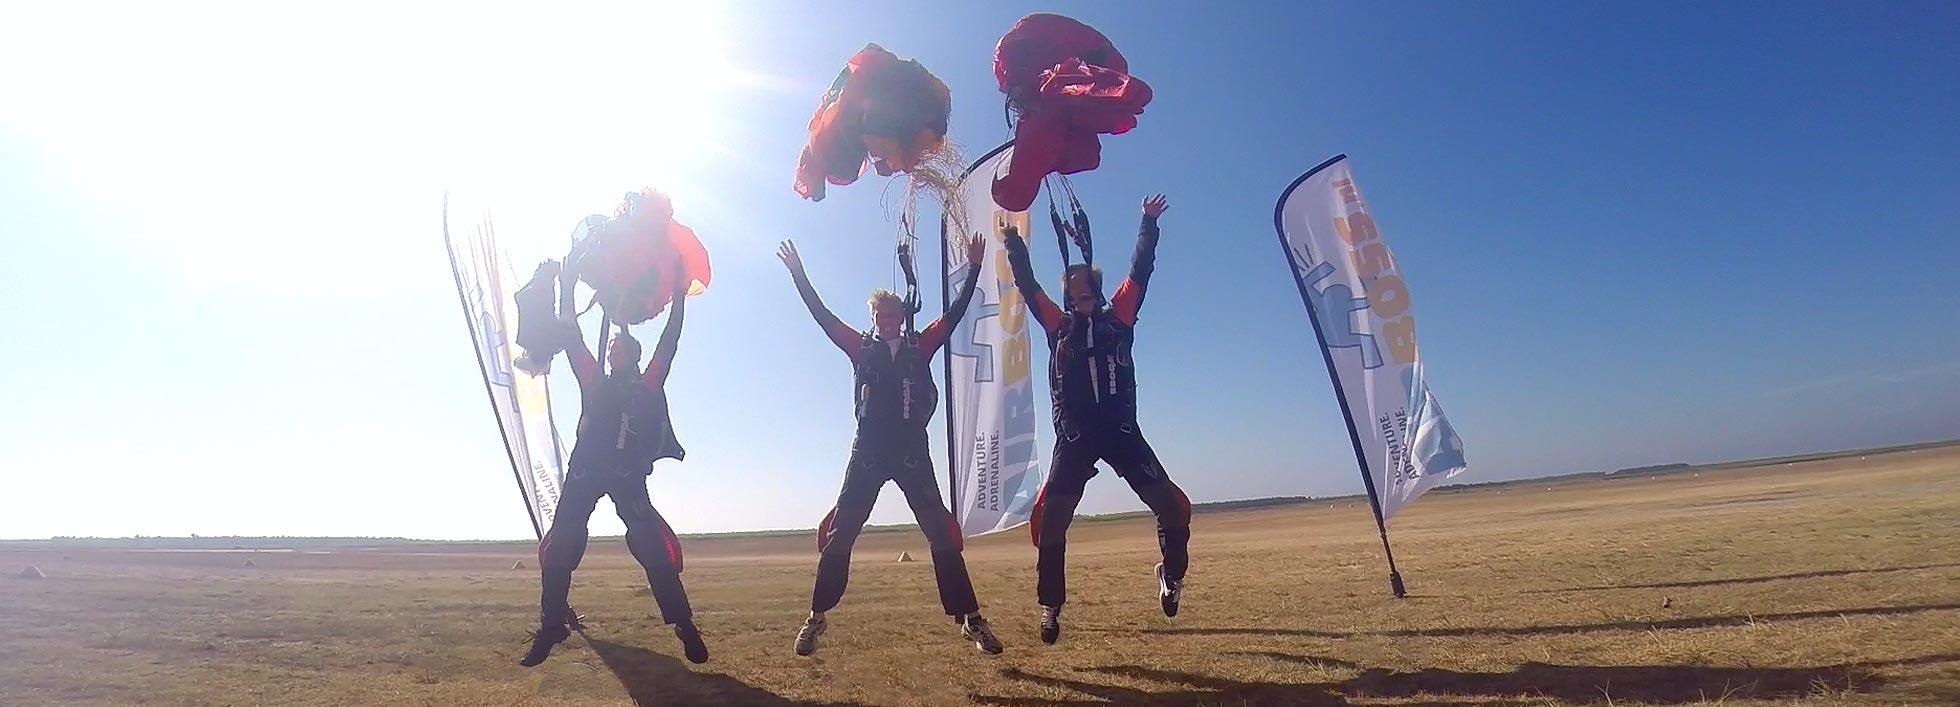 Skydive opleiding Frankrijk